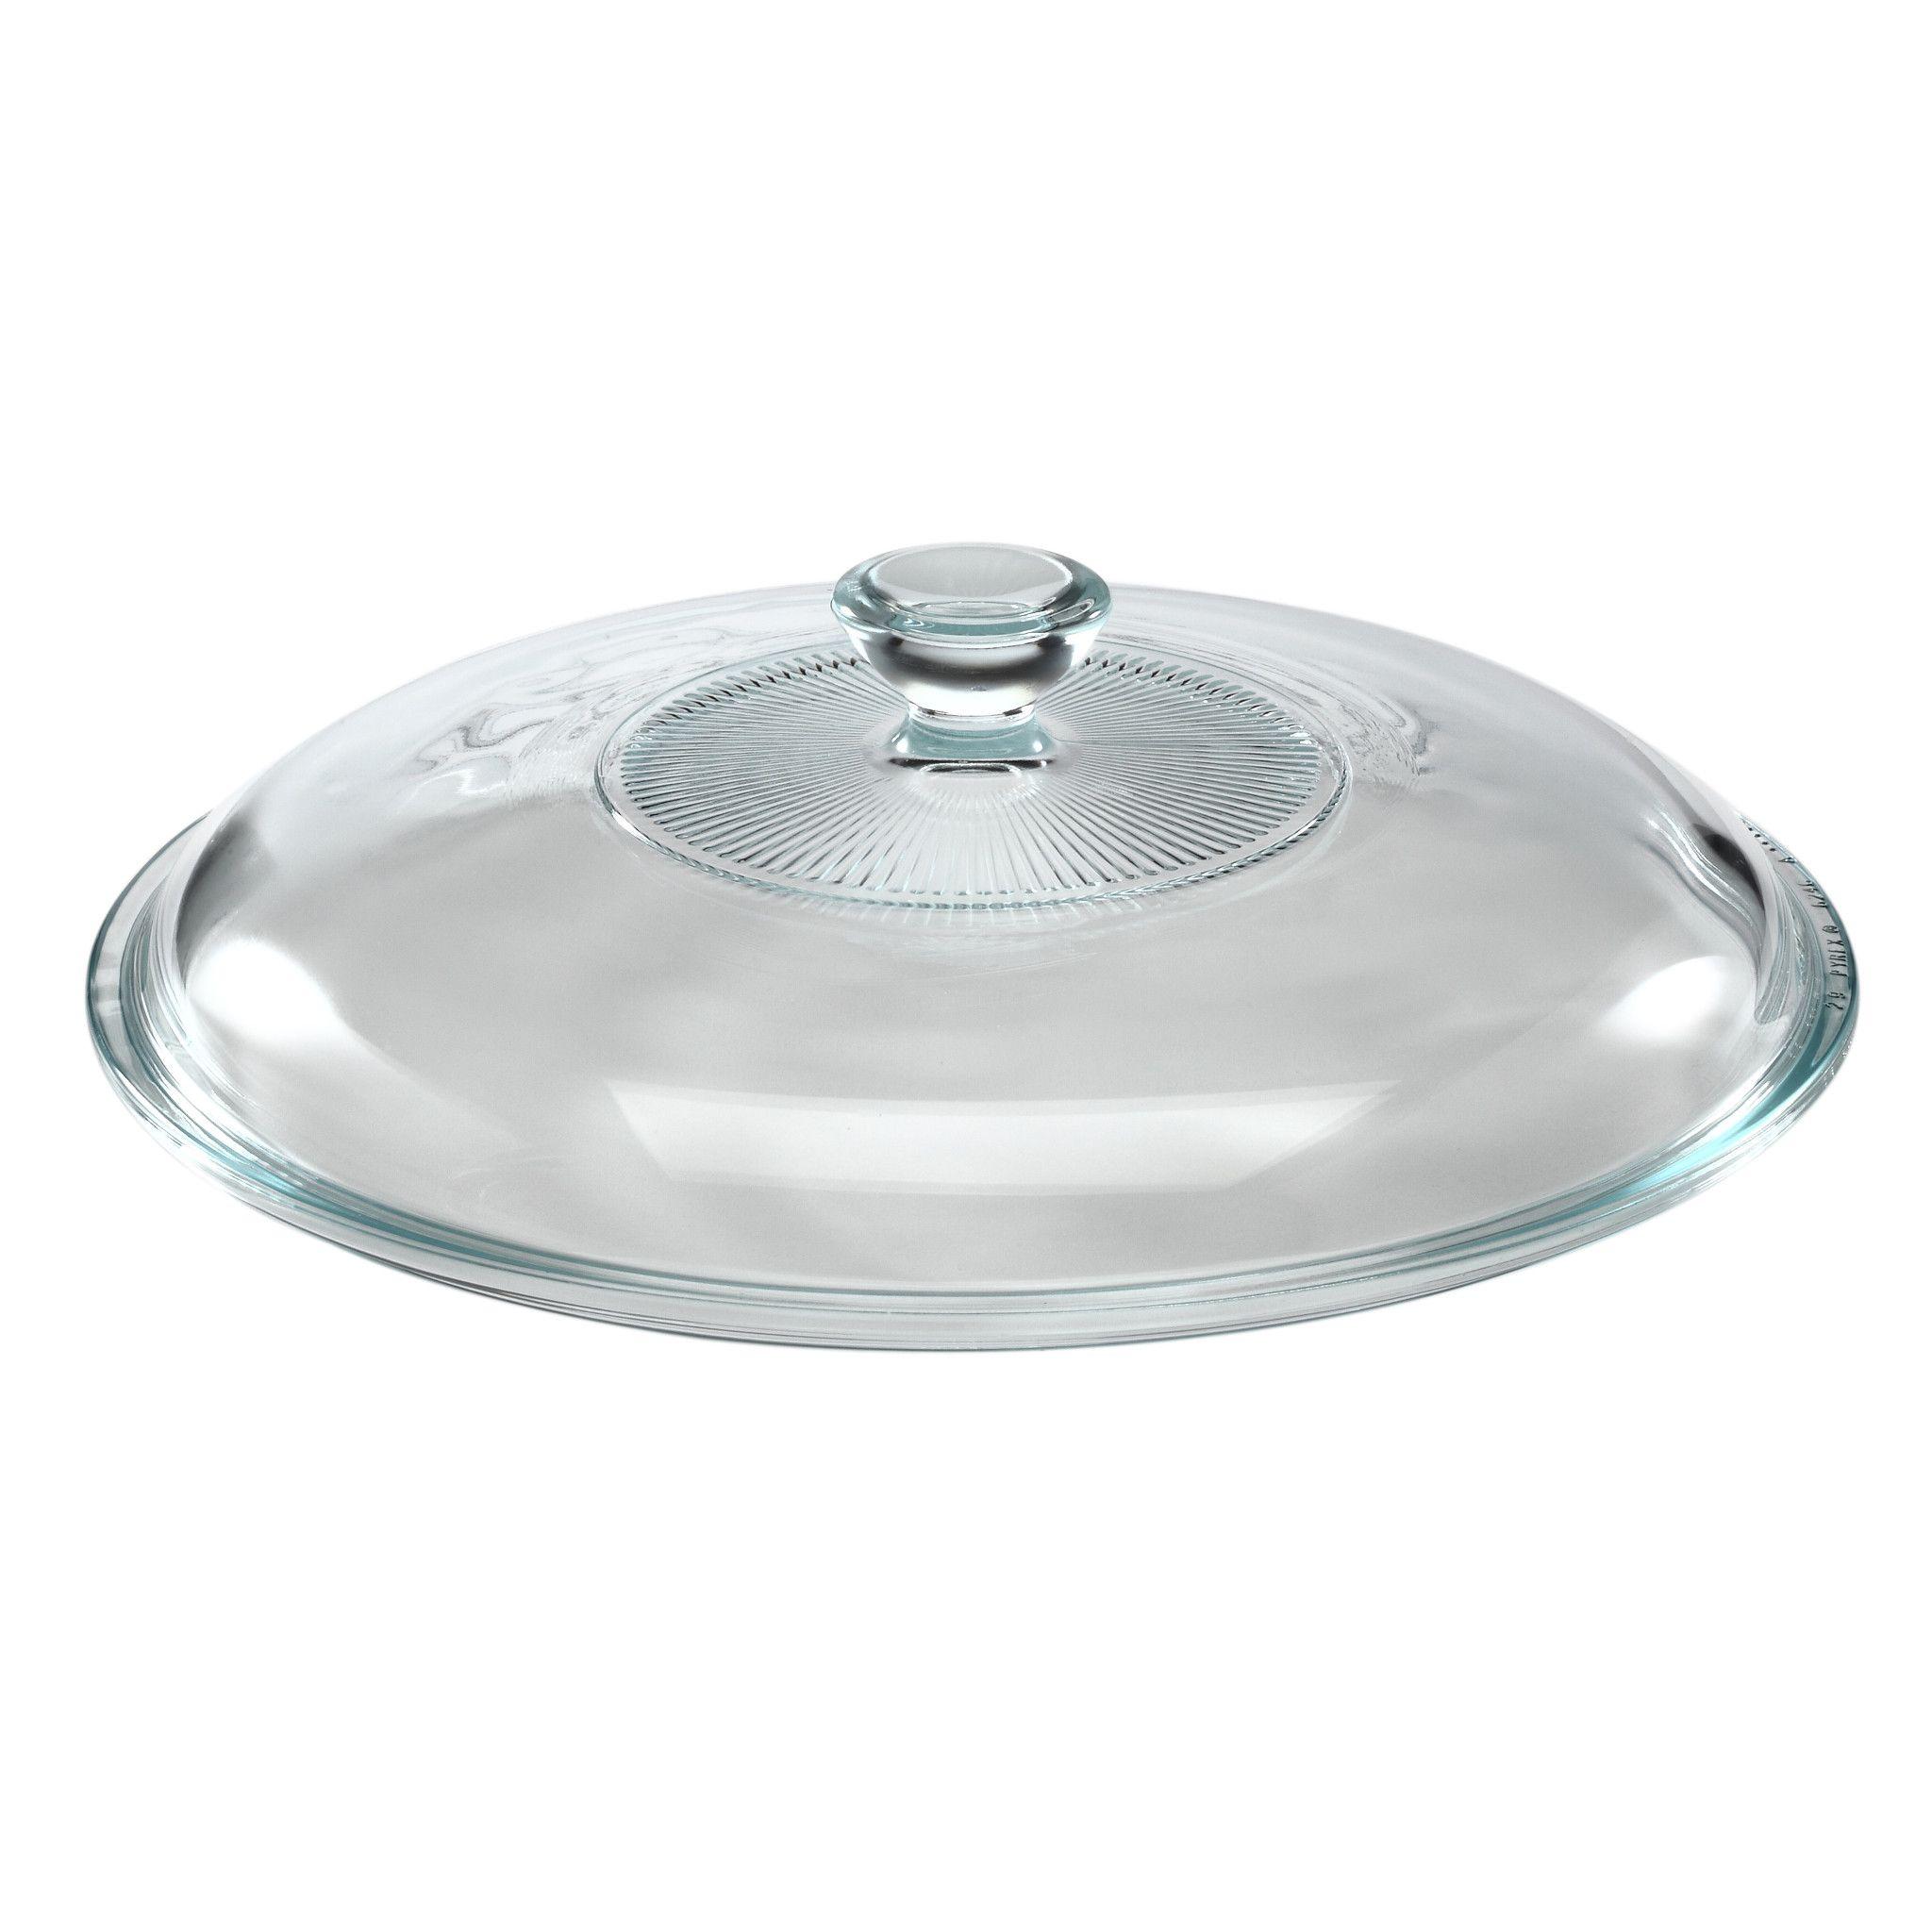 Pyrex 2-Qt Glass Casserole Lid